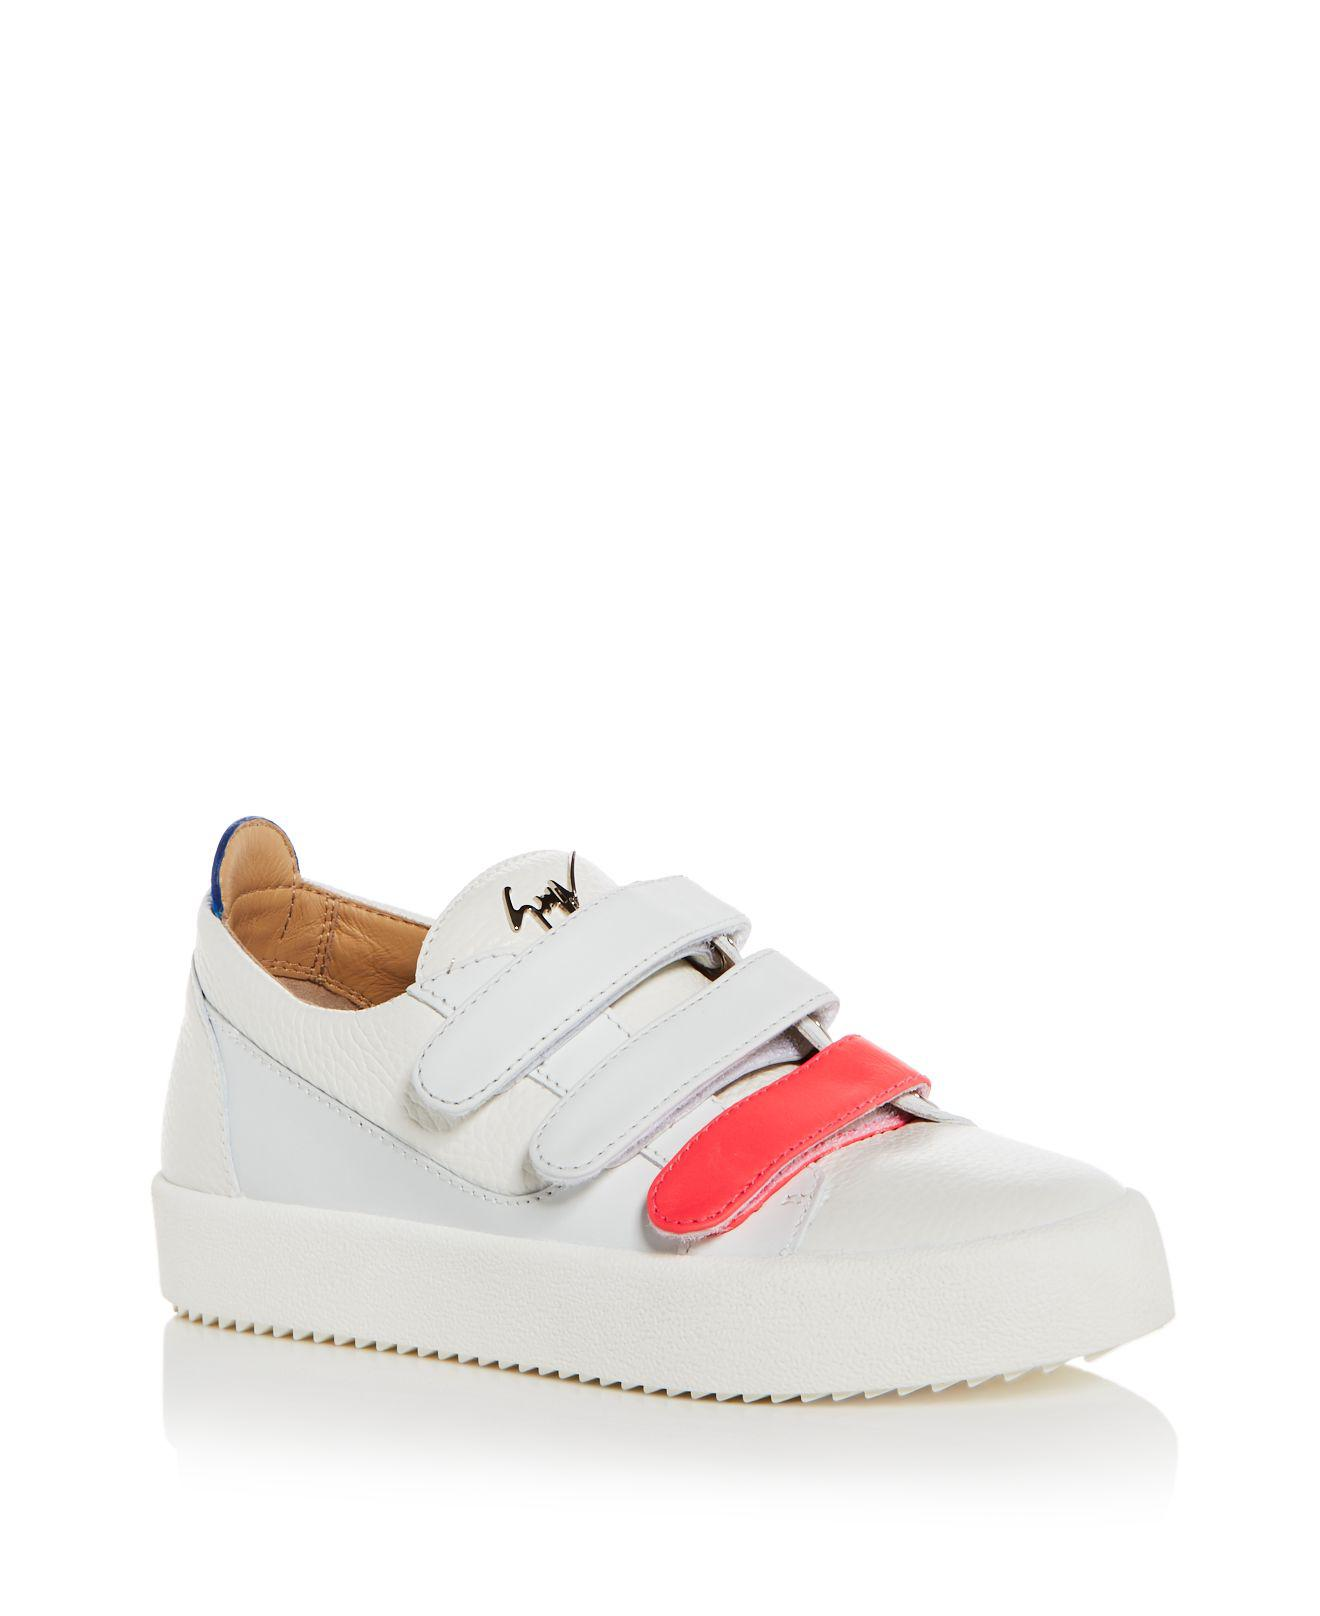 Lindos sneakers - White Giuseppe Zanotti f6pedCW